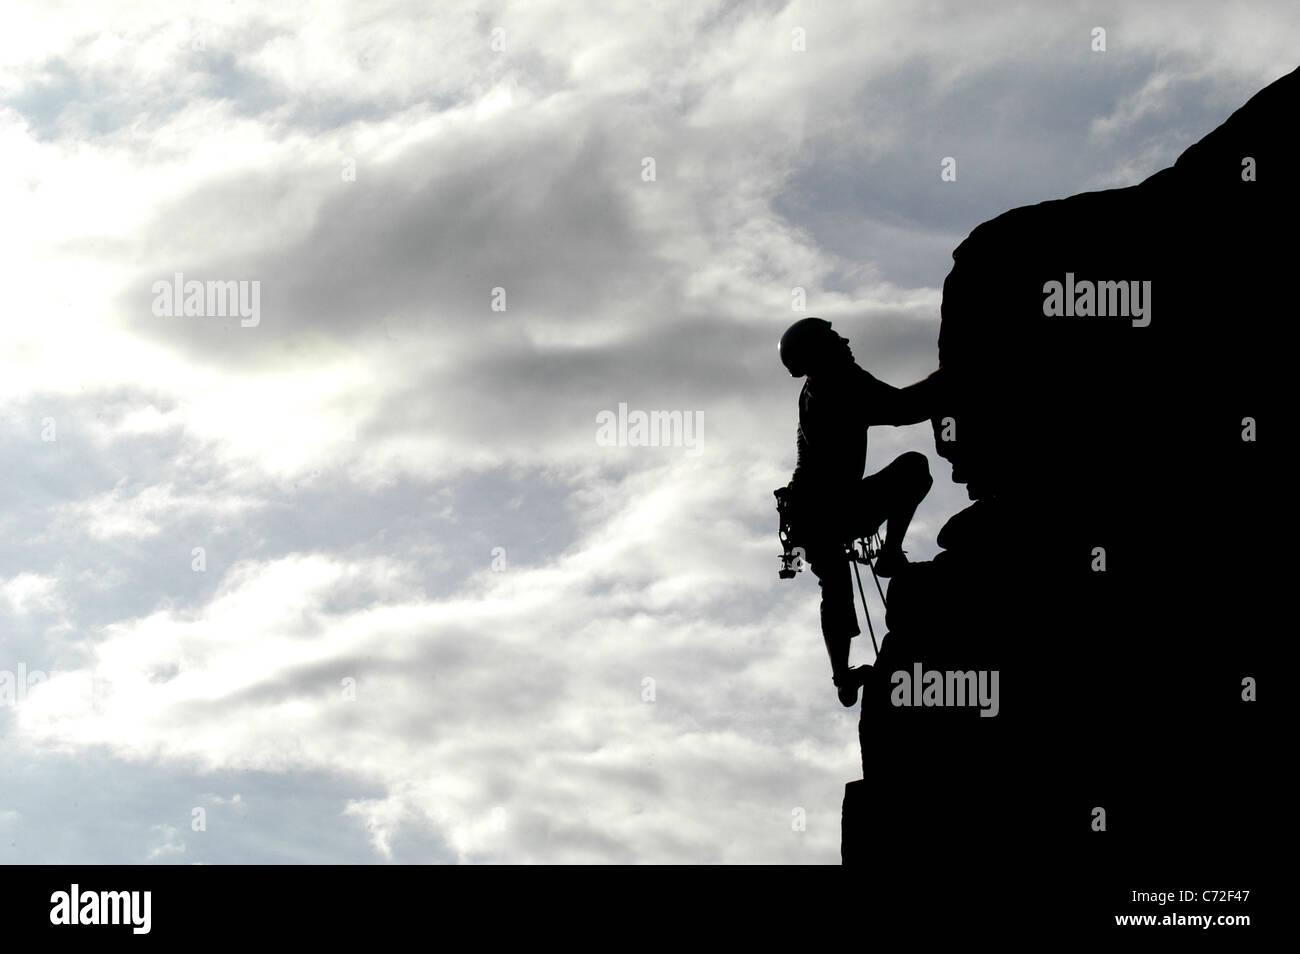 Les grimpeurs Derbyshire, Angleterre, Grande-Bretagne. Photo Stock